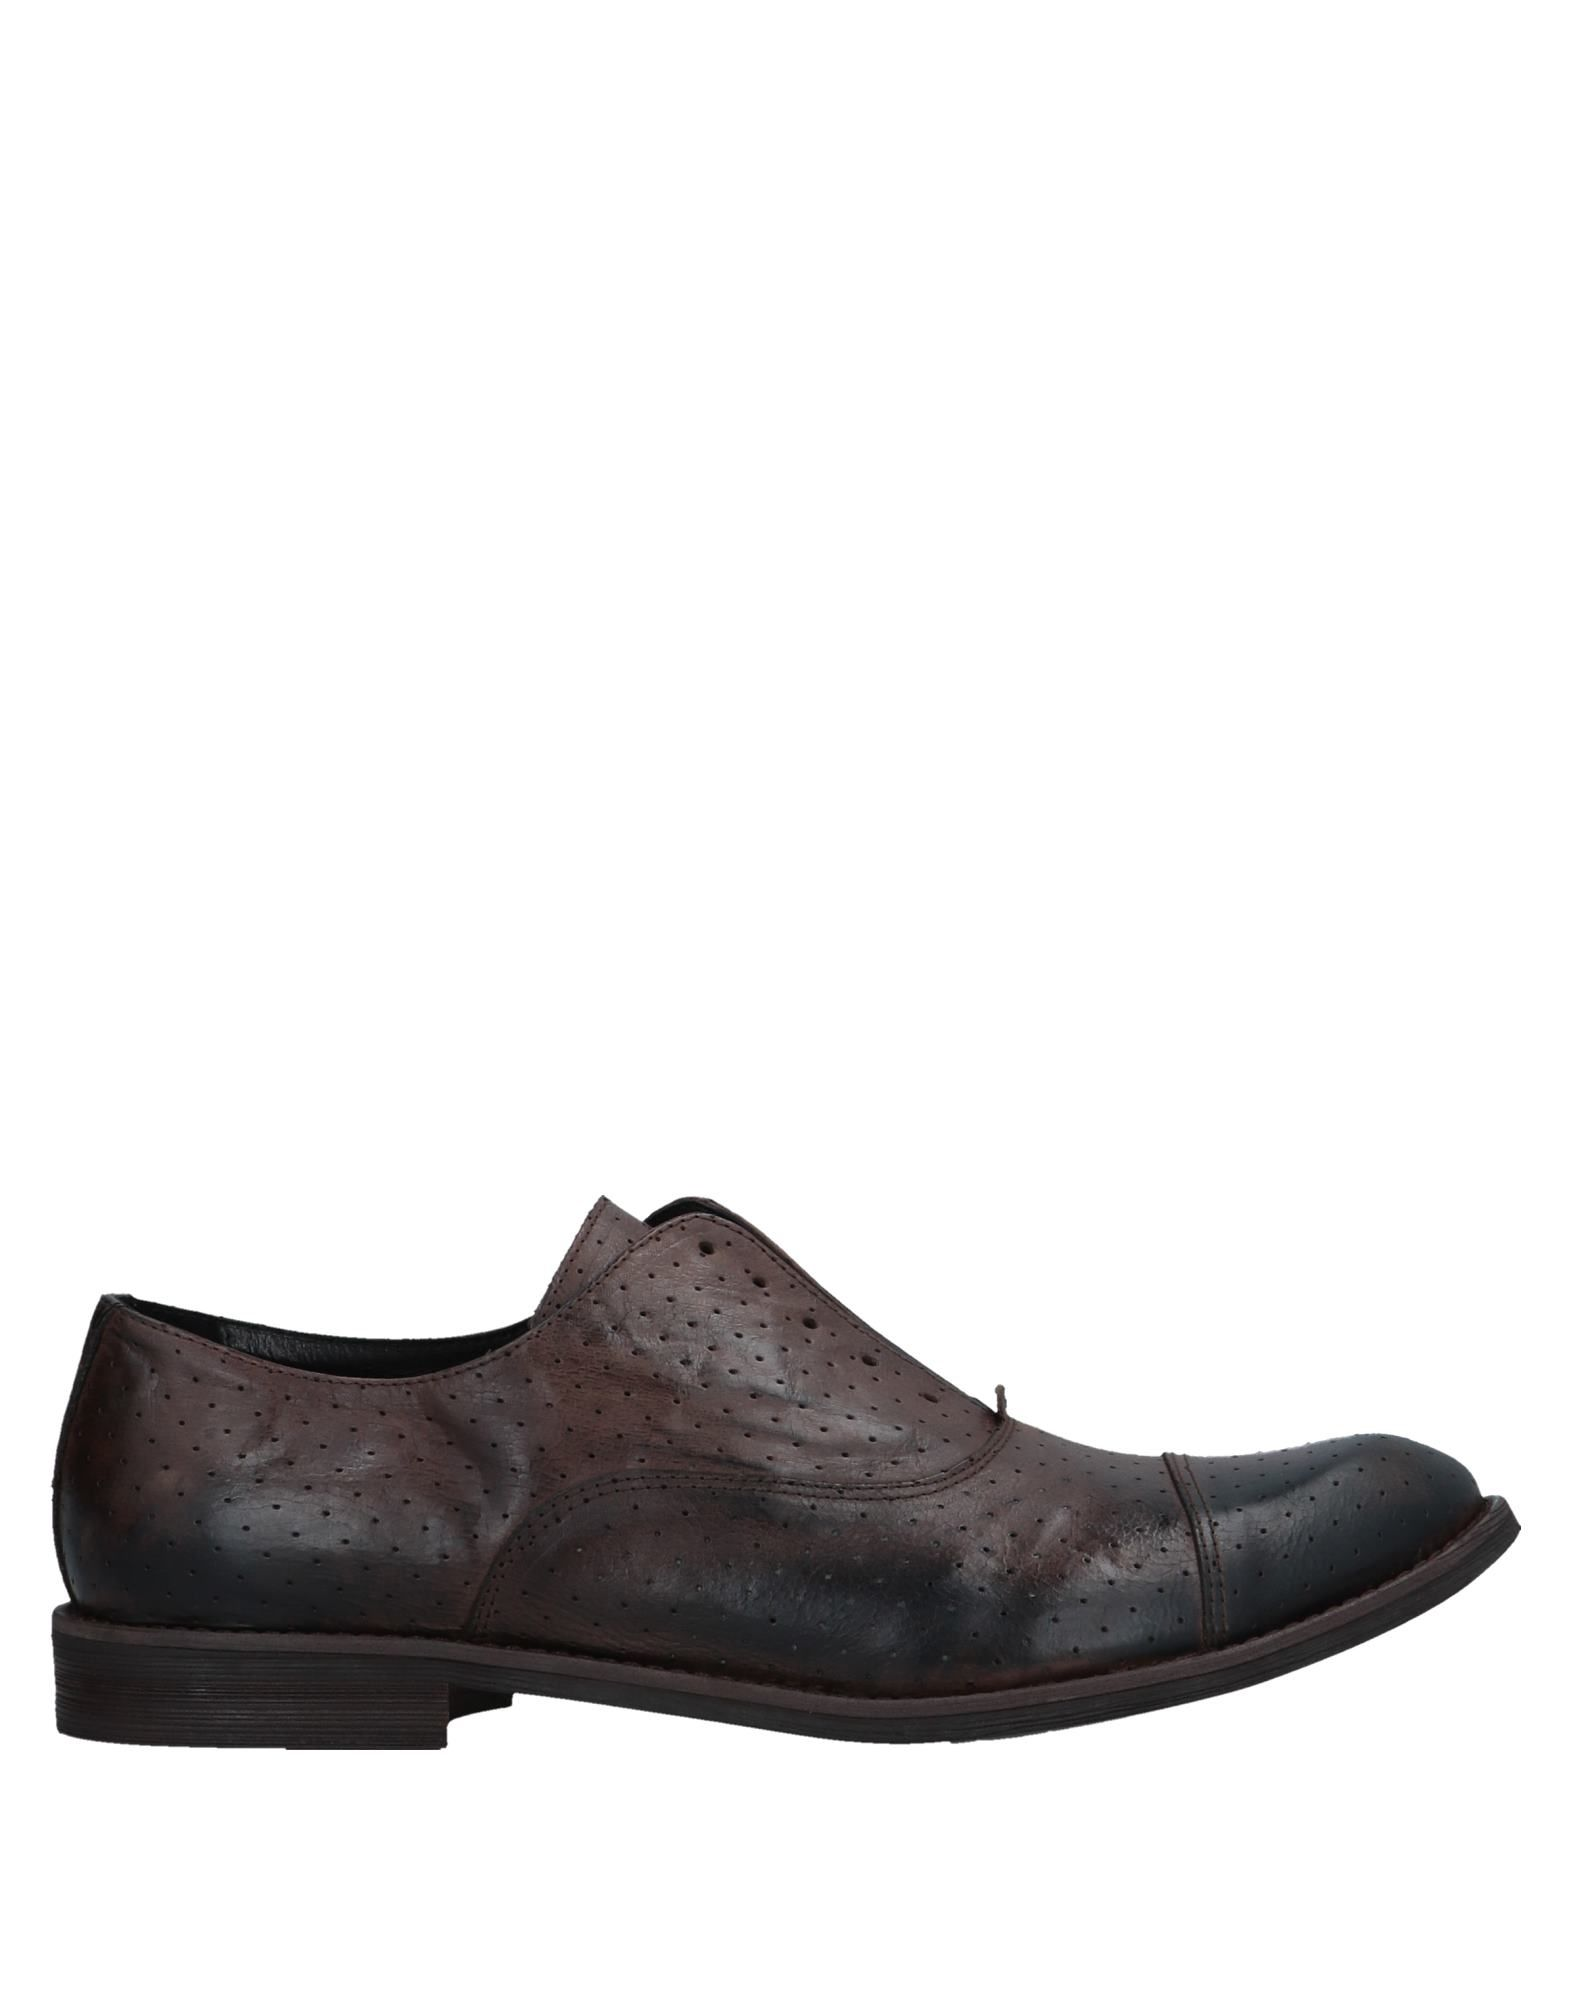 Rabatt echte Schuhe Officina 36 Mokassins Herren  11543547WM